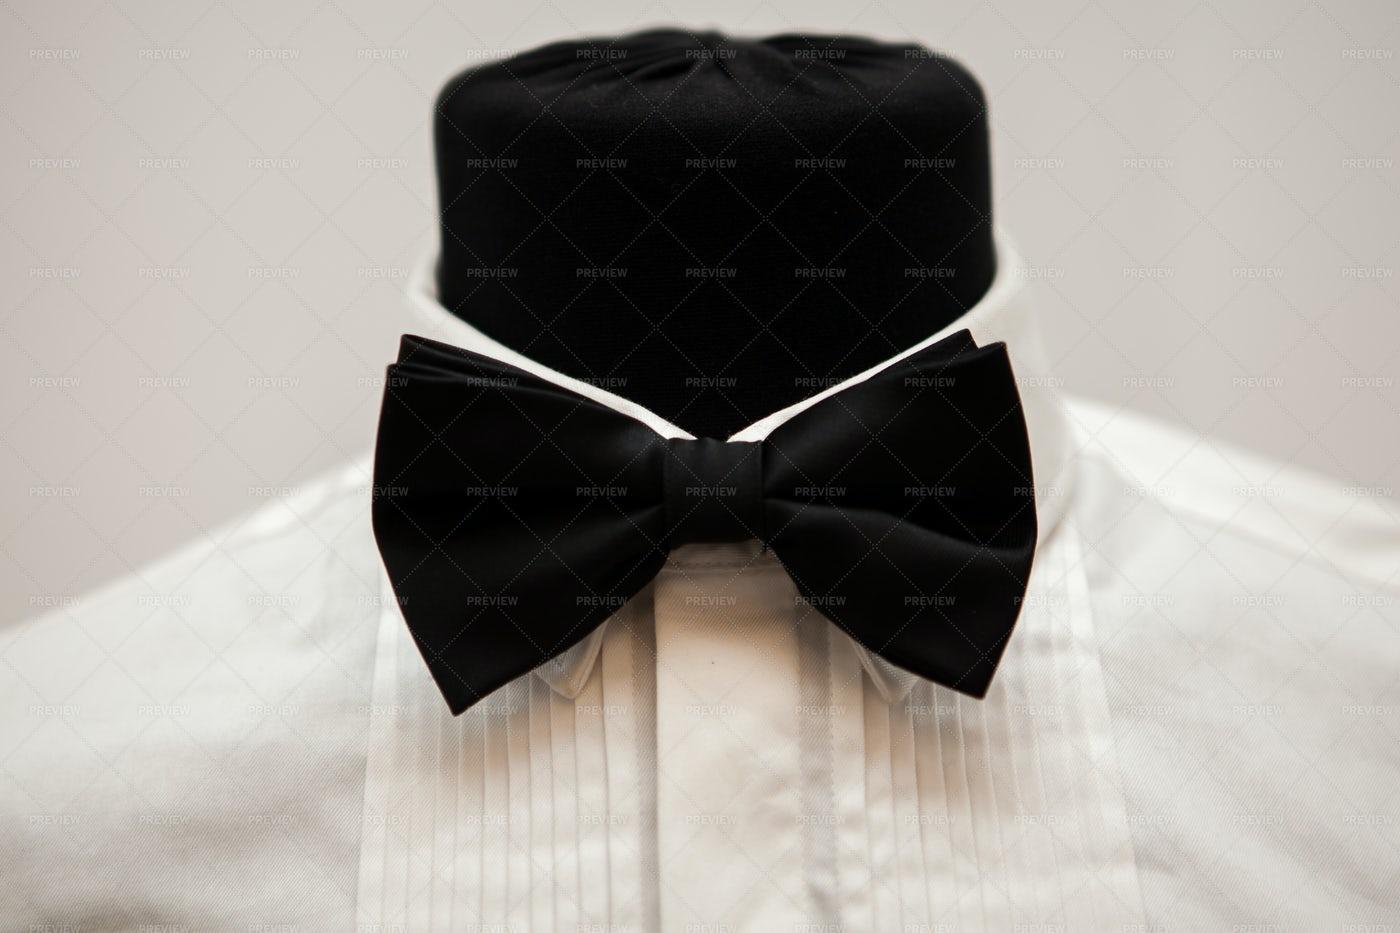 Formal Tux Shirt And Bowtie: Stock Photos